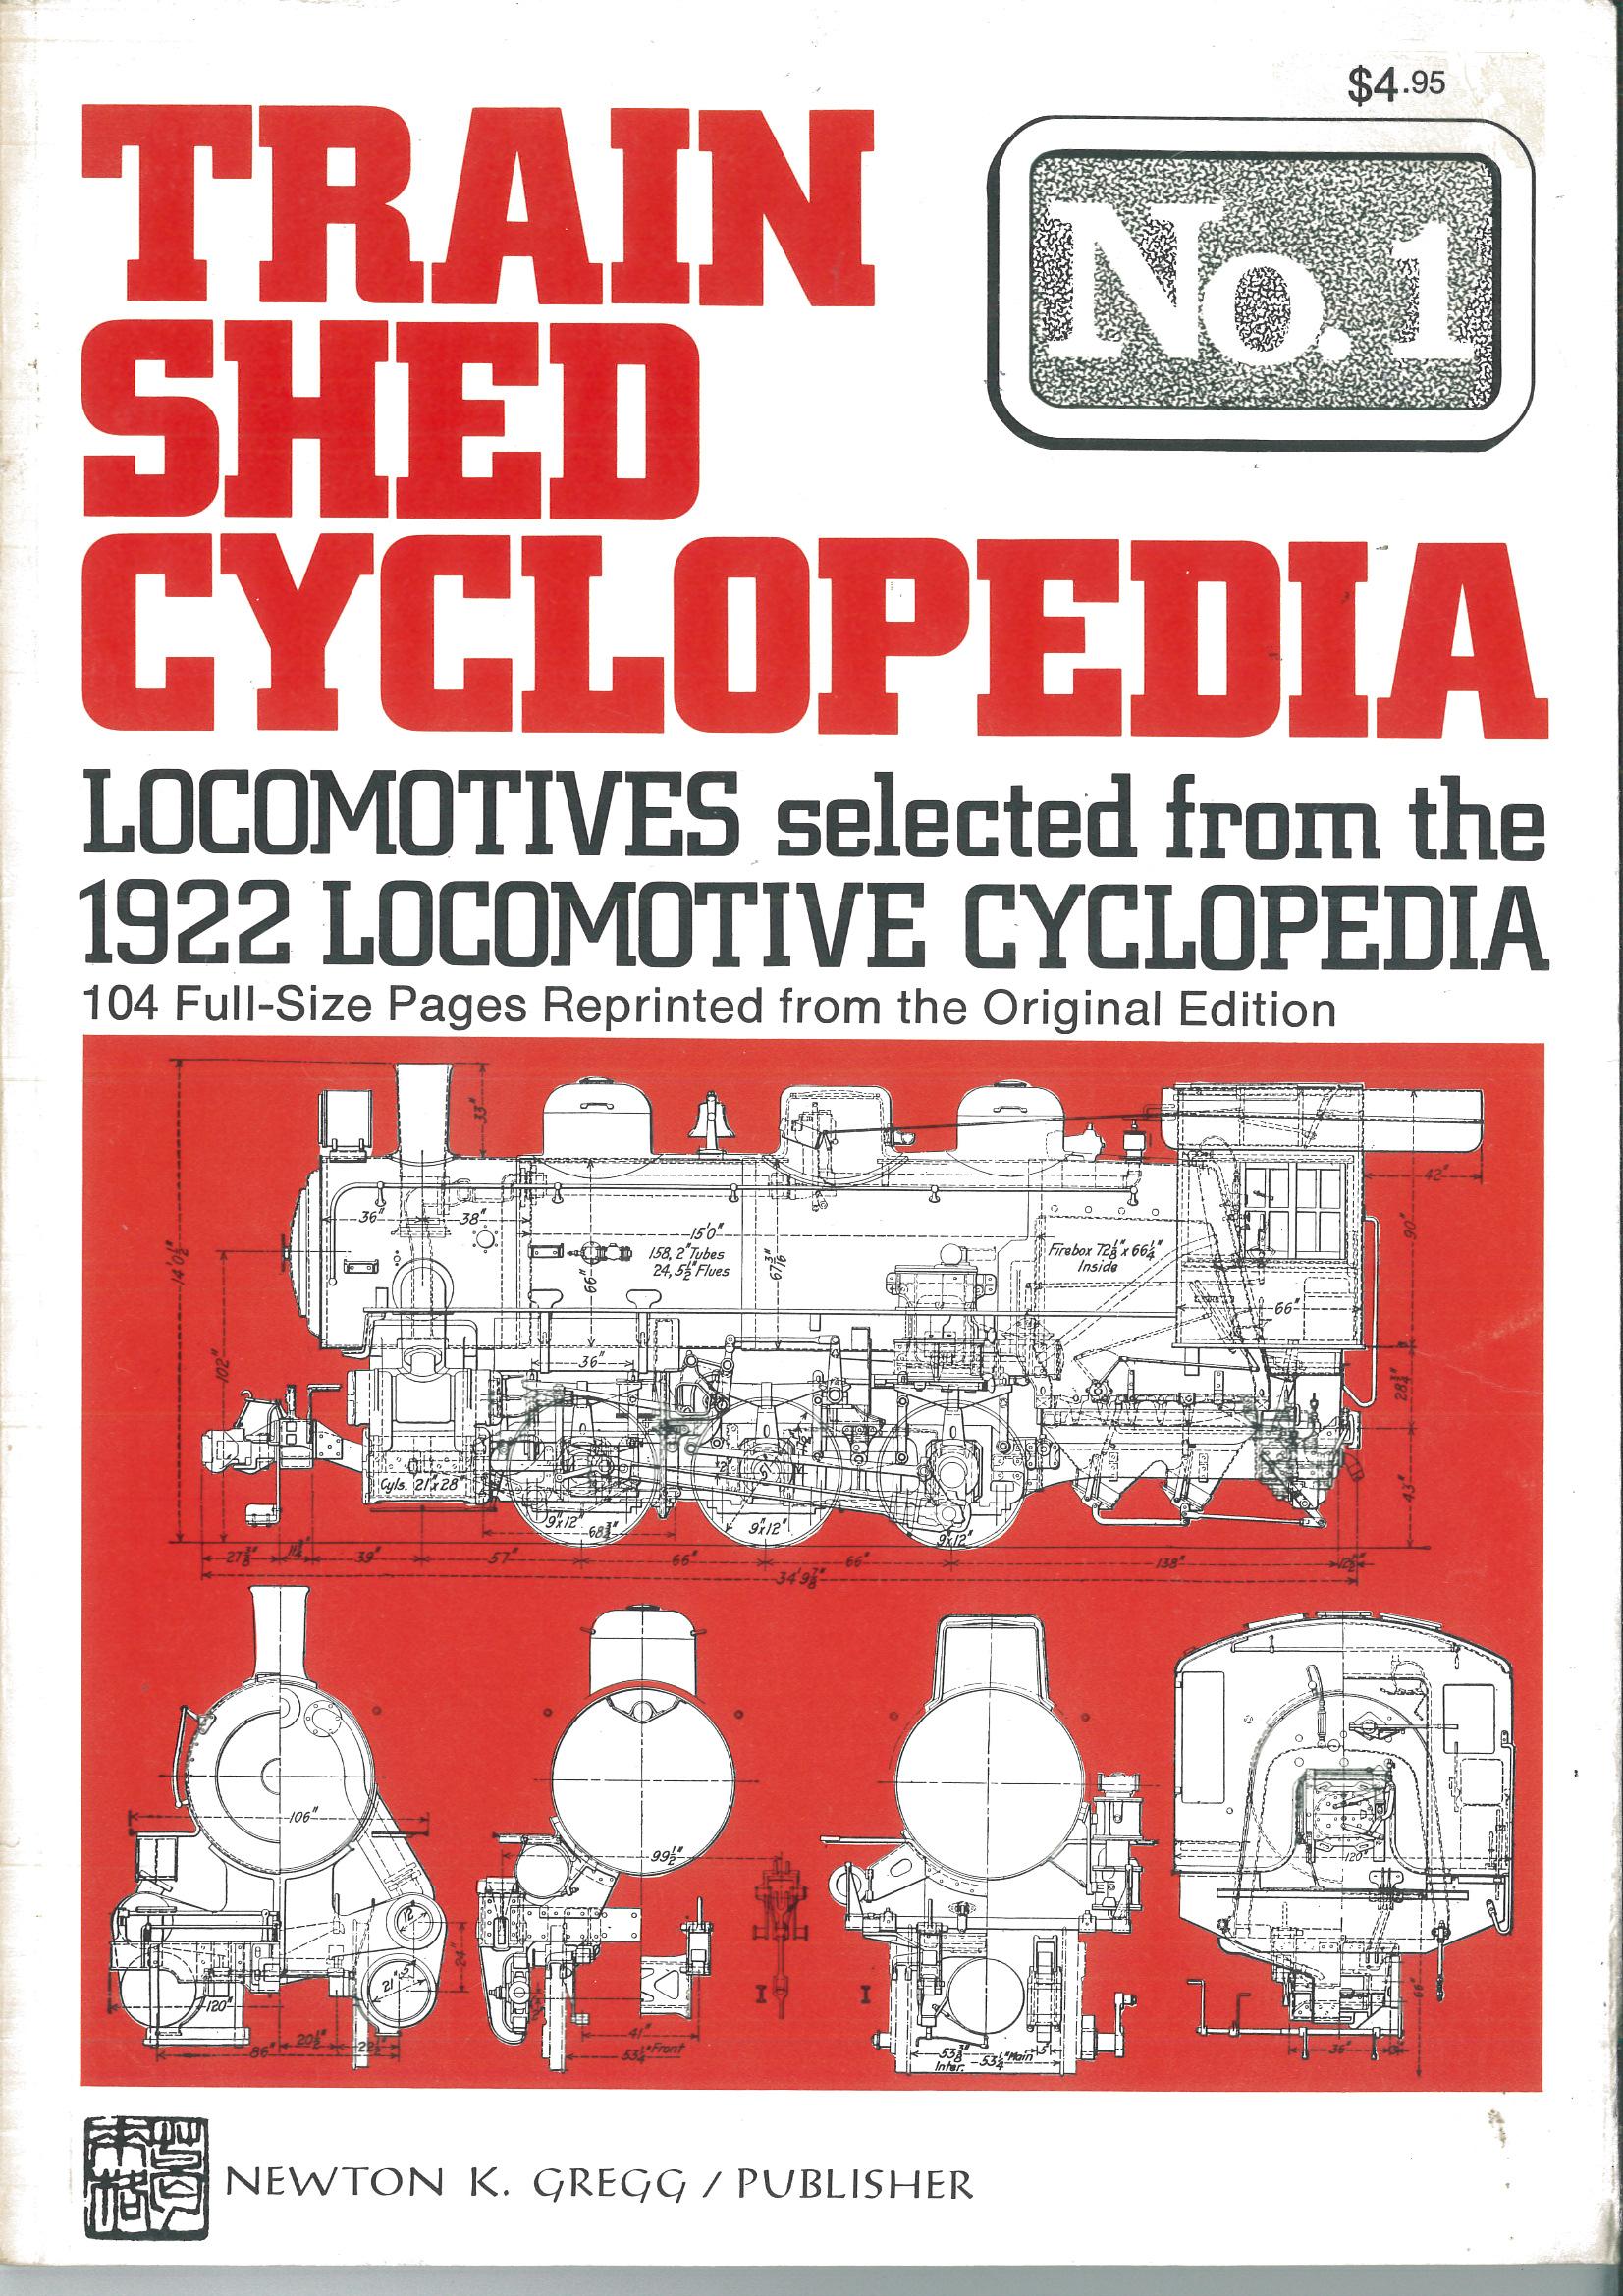 Train Shed Cyclopedia No. 1: Locomotives from the 1922 Cyclopedia  | günstig bestellen bei Modelleisenbahn Center  MCS Vertriebs GmbH